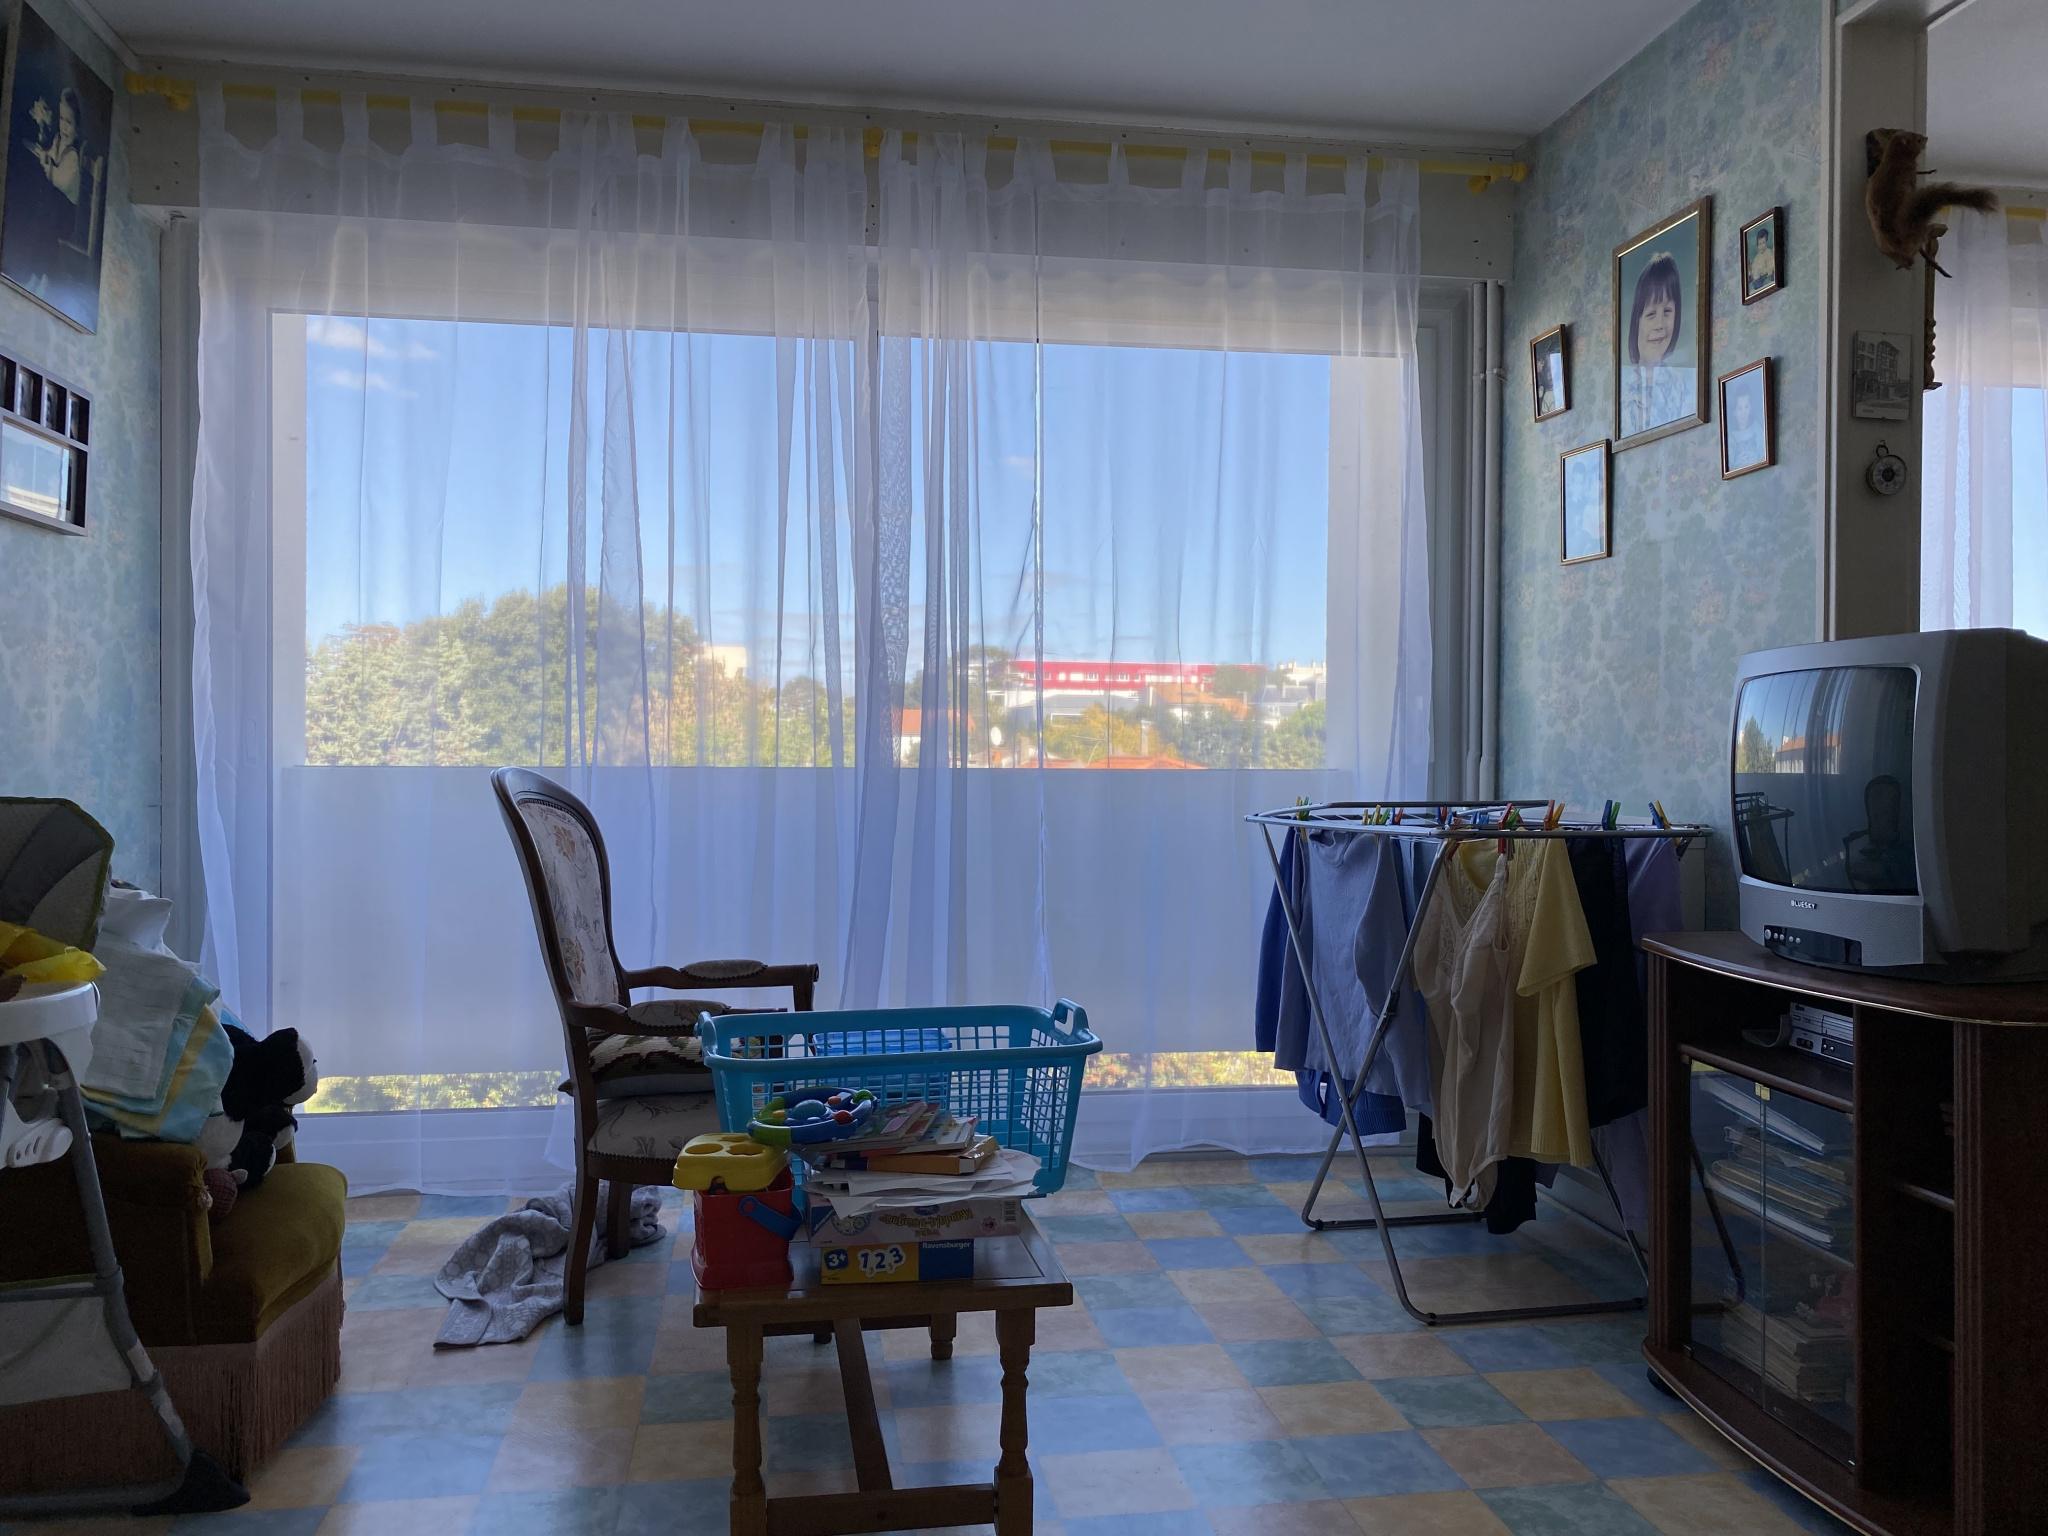 appartement la rochelle LA ROCHELLE - GRAND TYPE 2 AVEC BALCONS